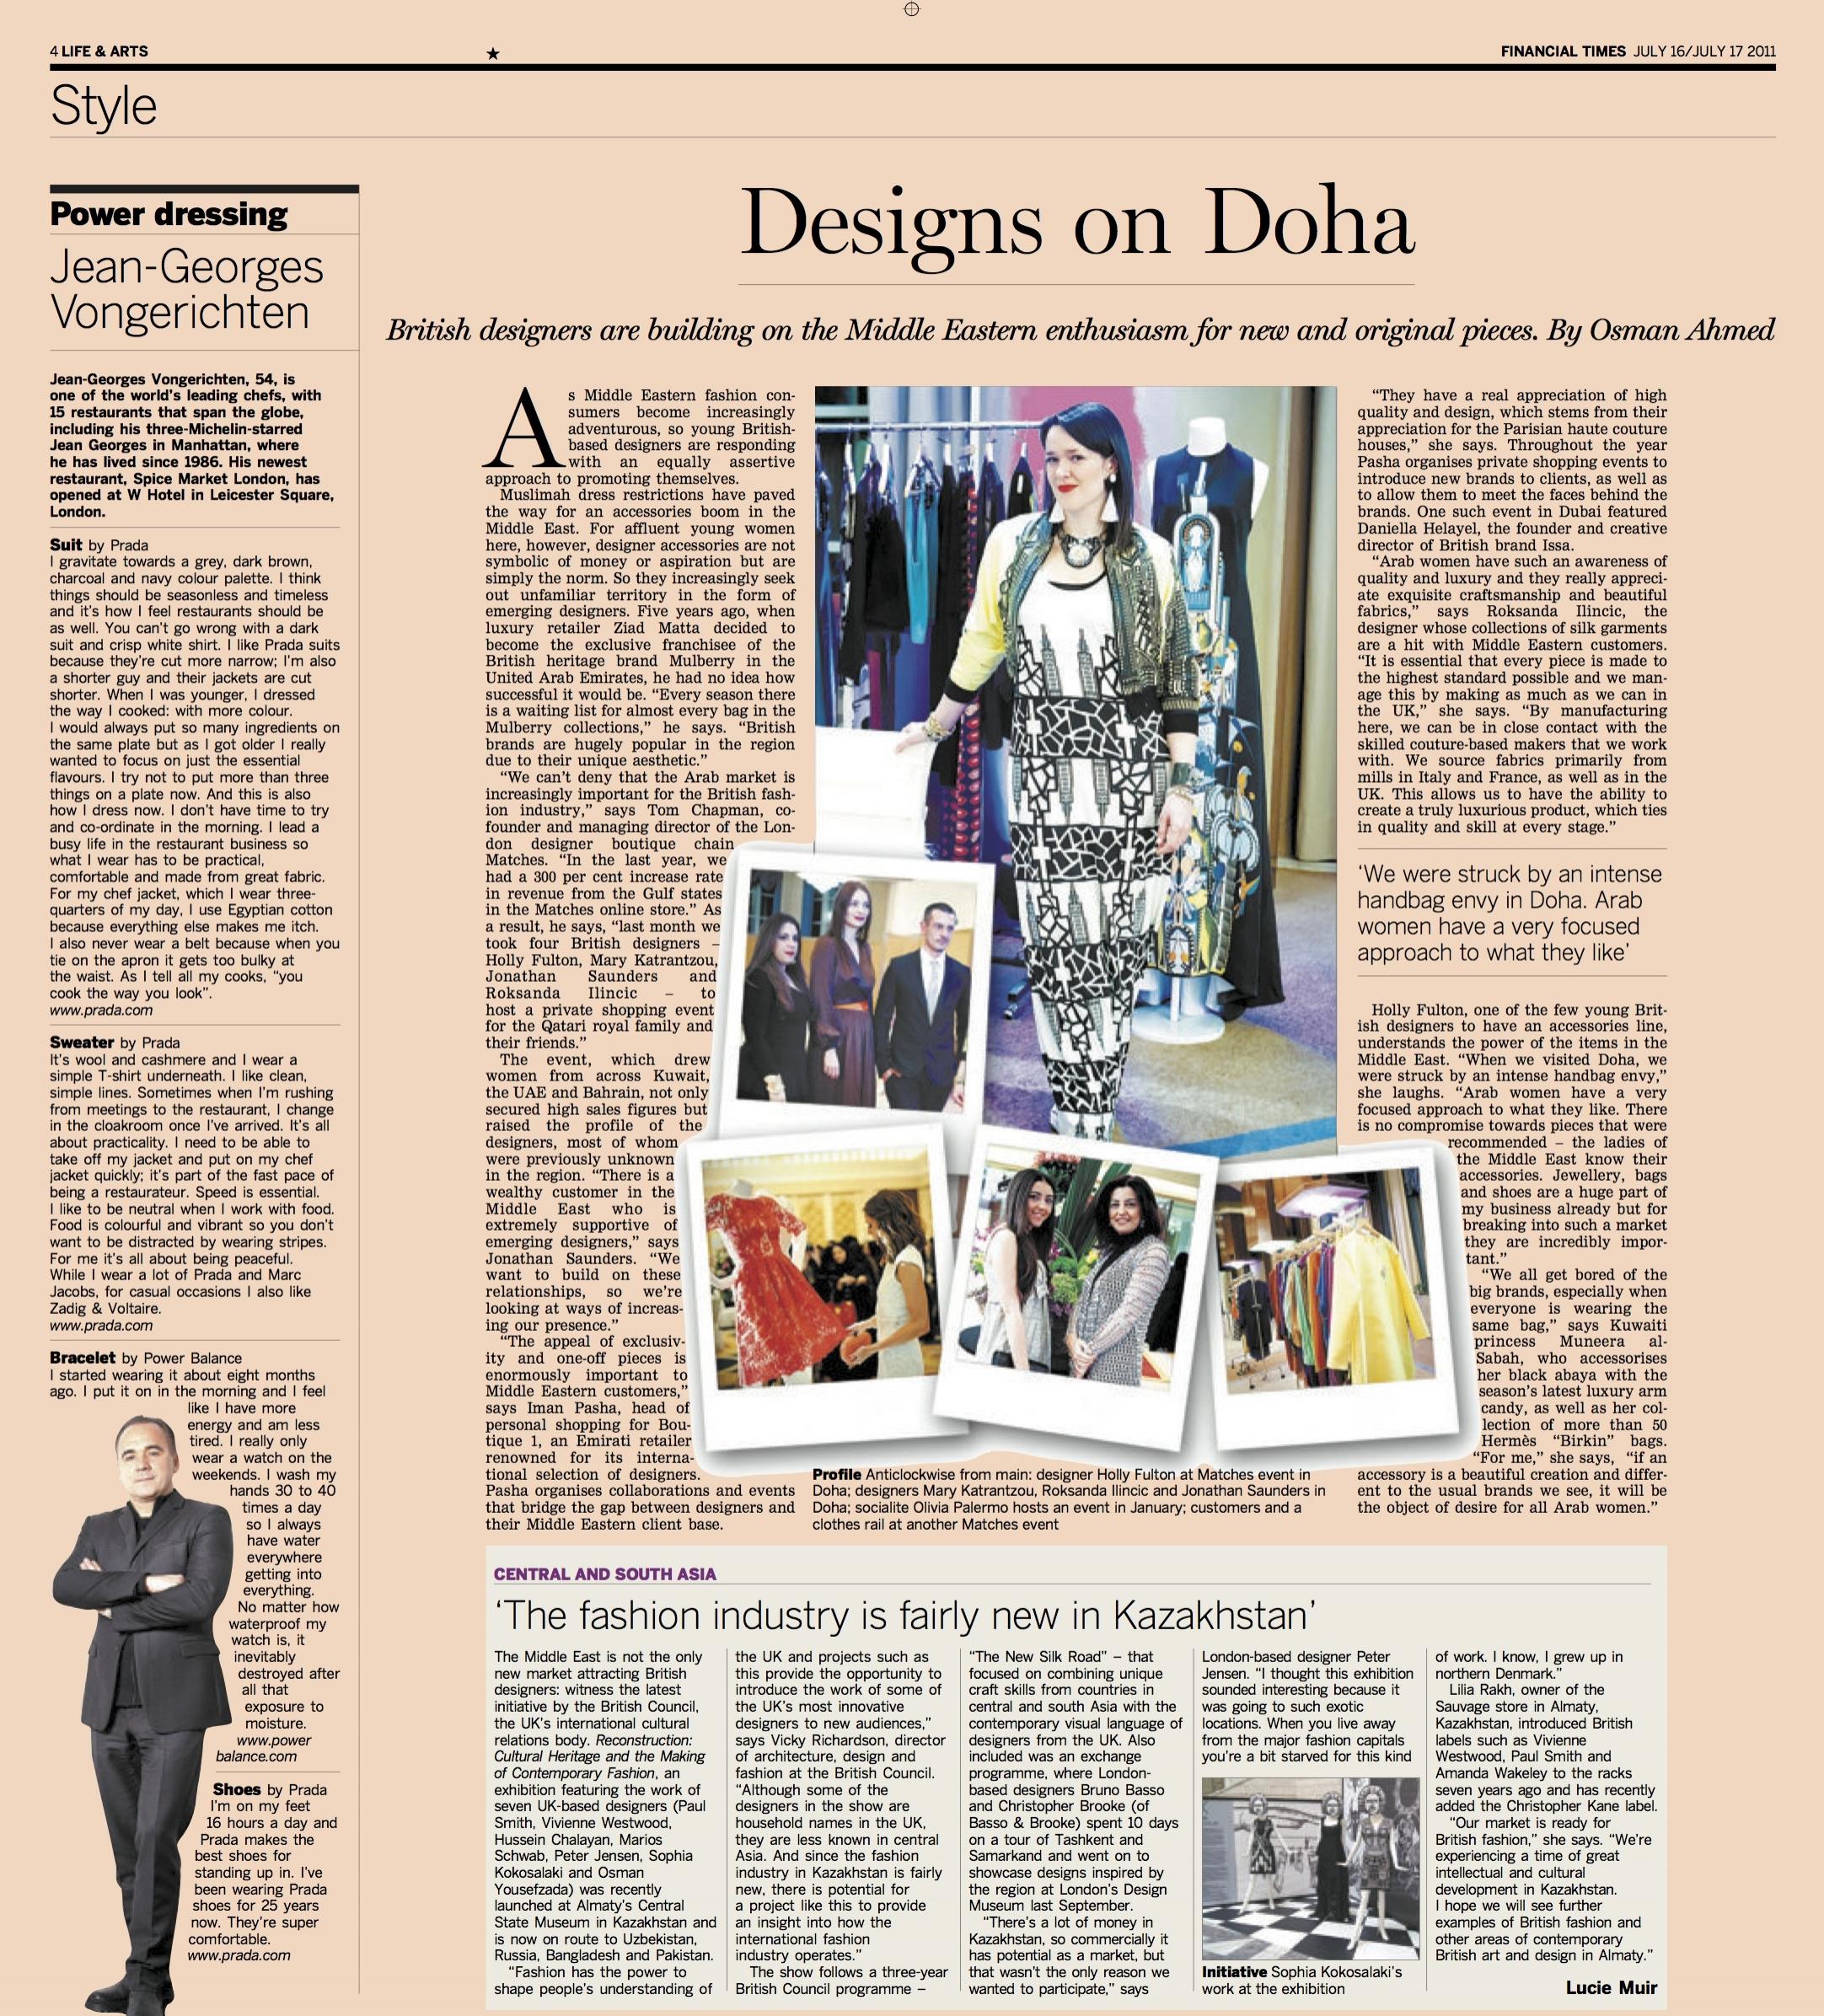 Designs on Doha, Financial Times